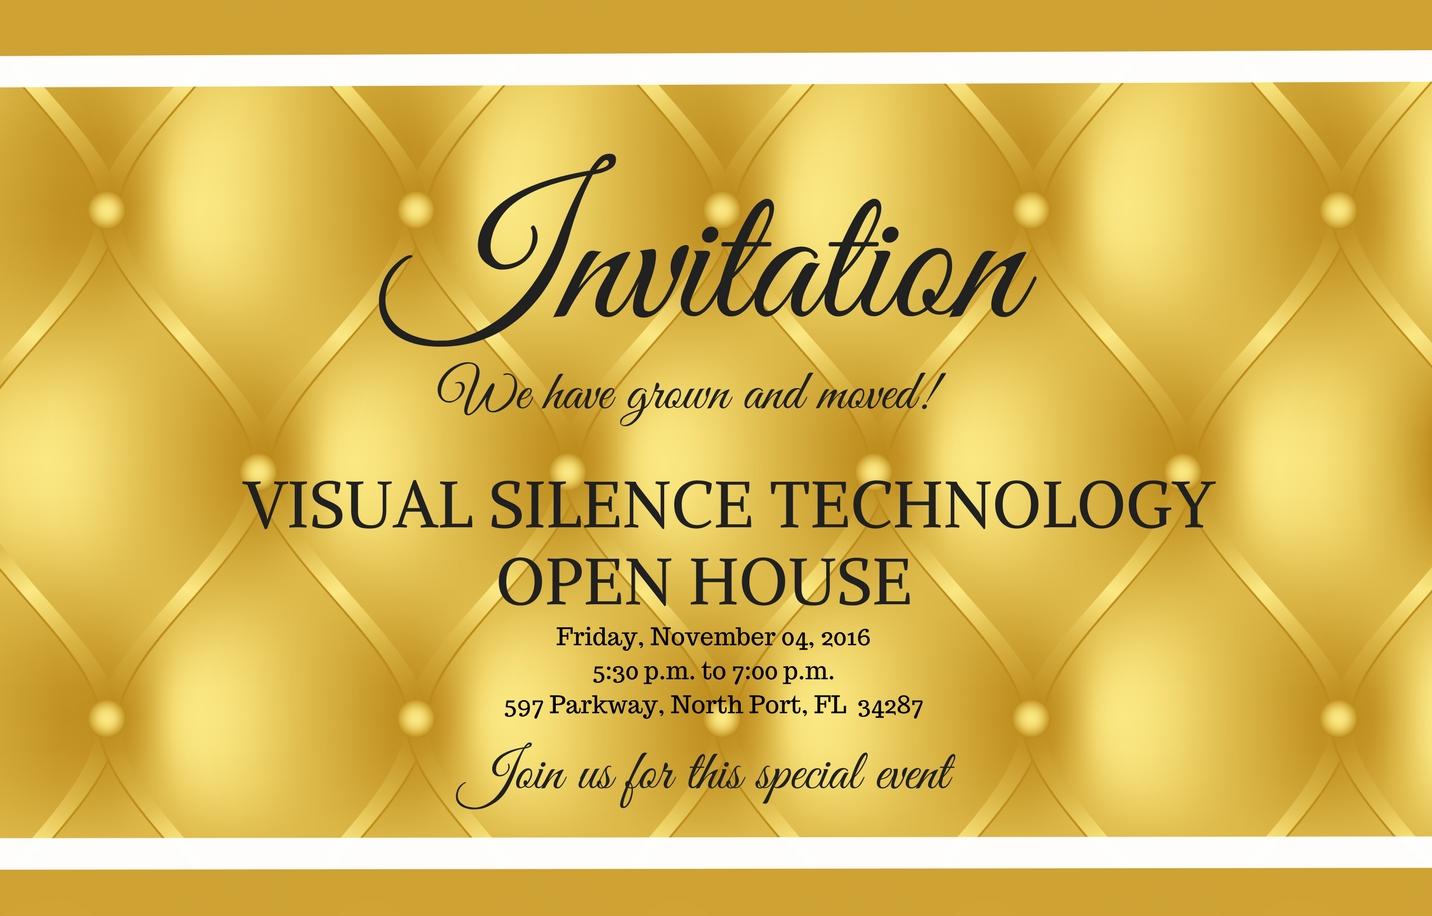 GoldOpenHouse- thickwhite-1432x916 pixels-11-15-16-ApprovedInvite_OpenHosue (1)